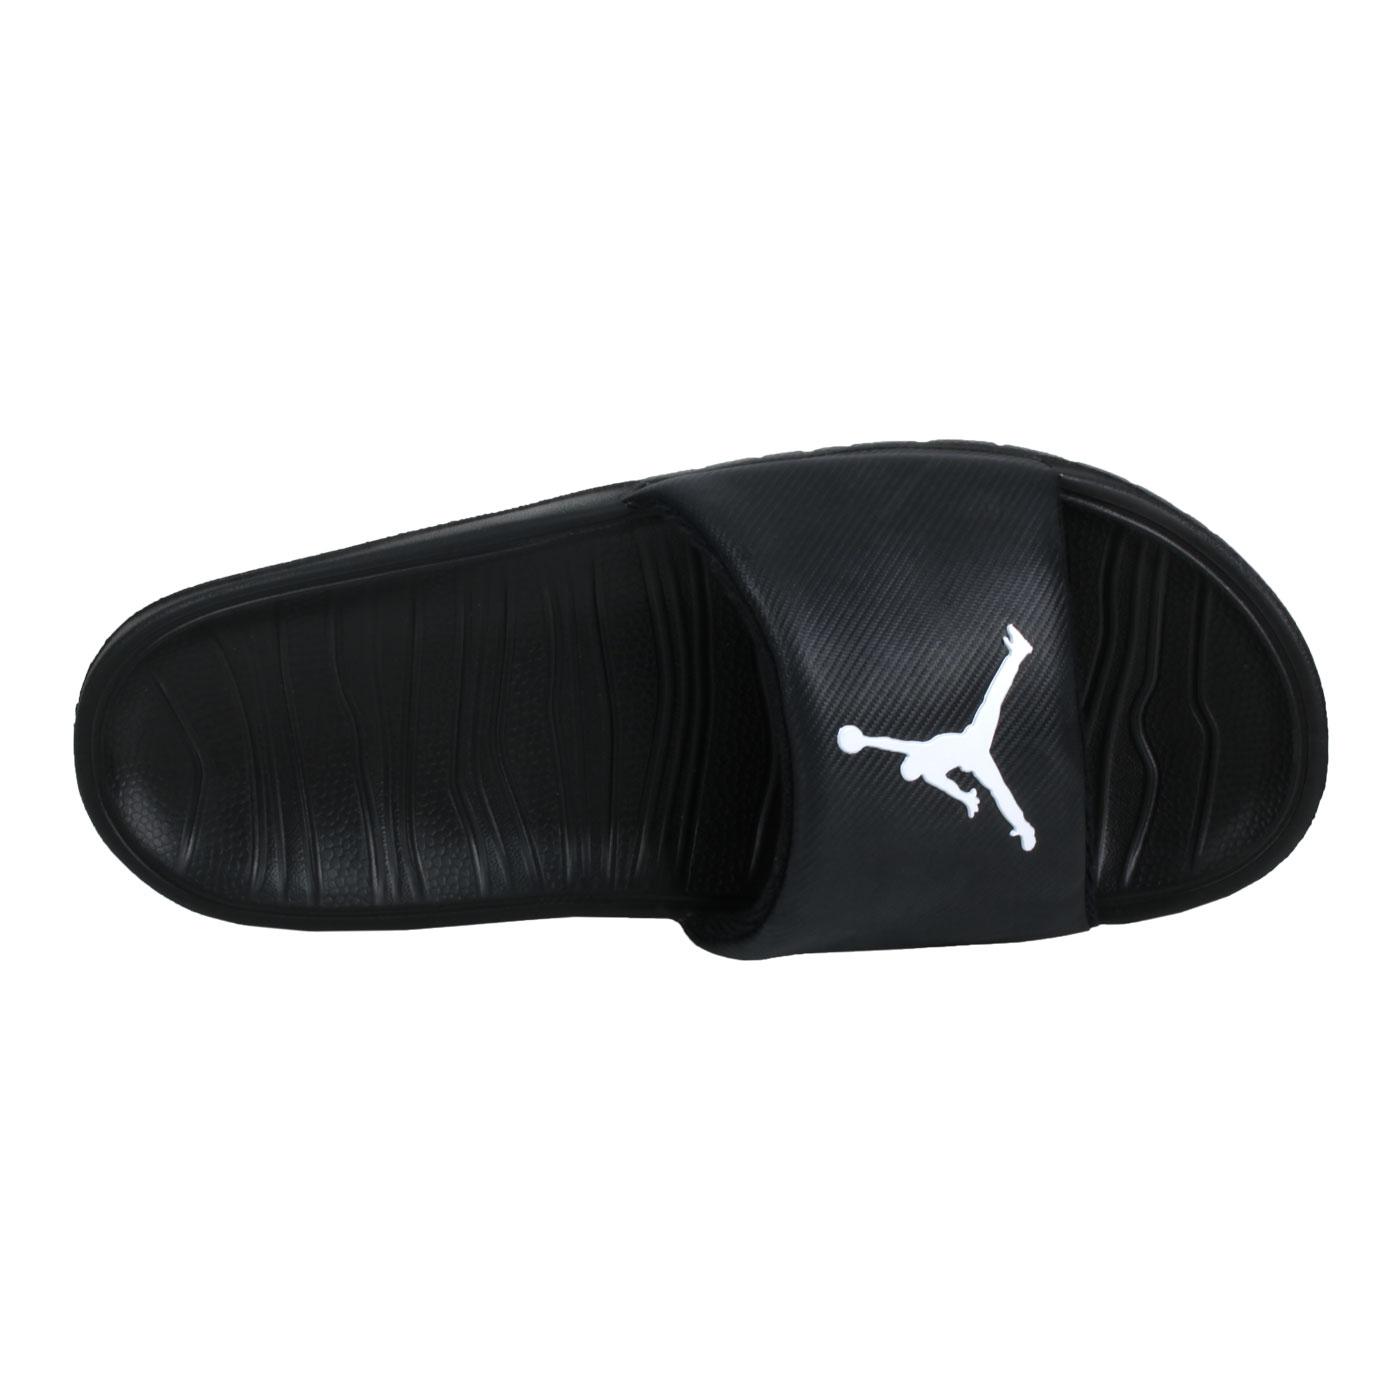 NIKE 男款拖鞋JORDAN  @BREAK SLIDE@AR6374010 - 黑白